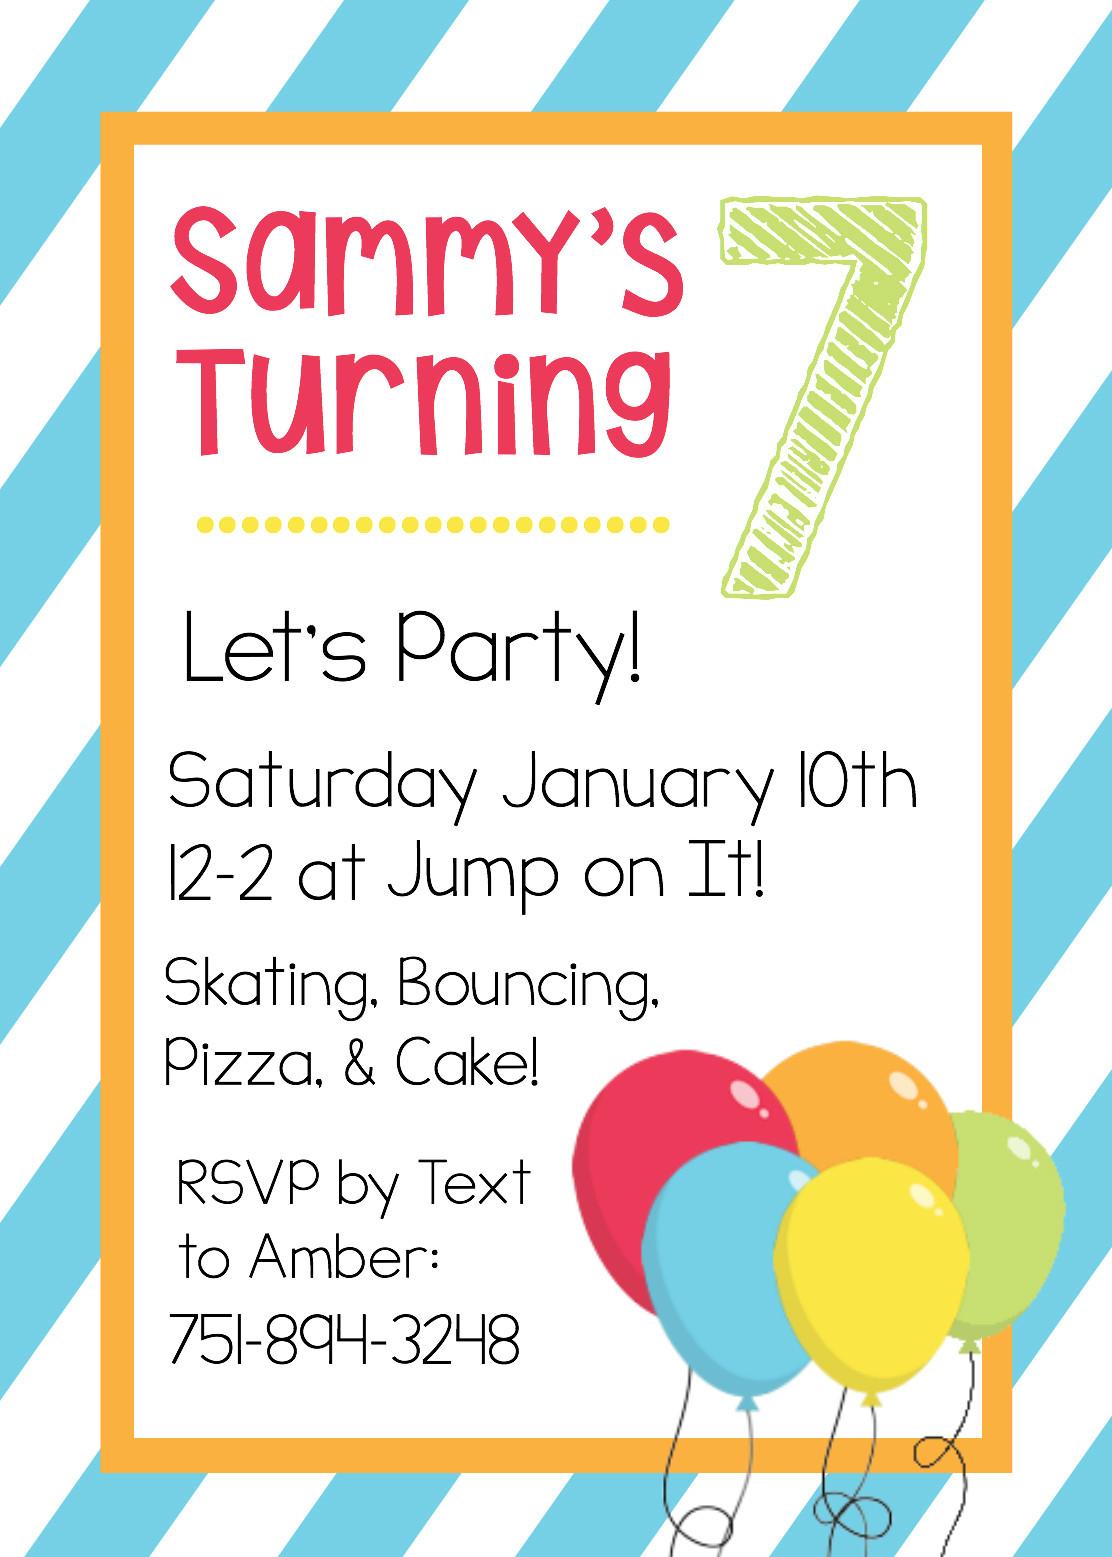 Free Templates For Birthday Invitations  Free Printable Birthday Invitation Templates